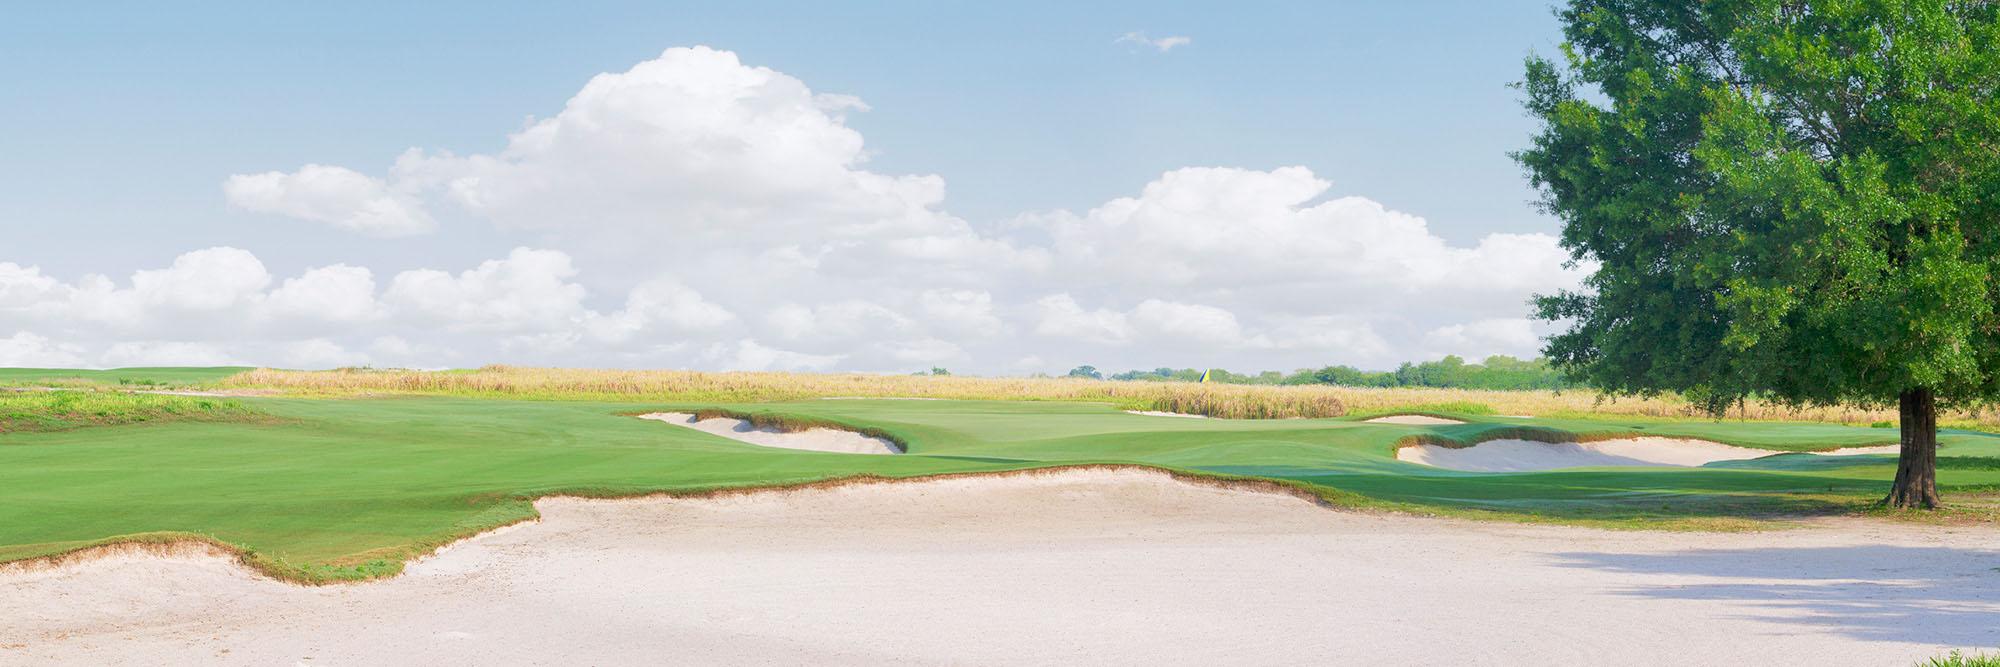 Golf Course Image - Streamsong Blue No. 10